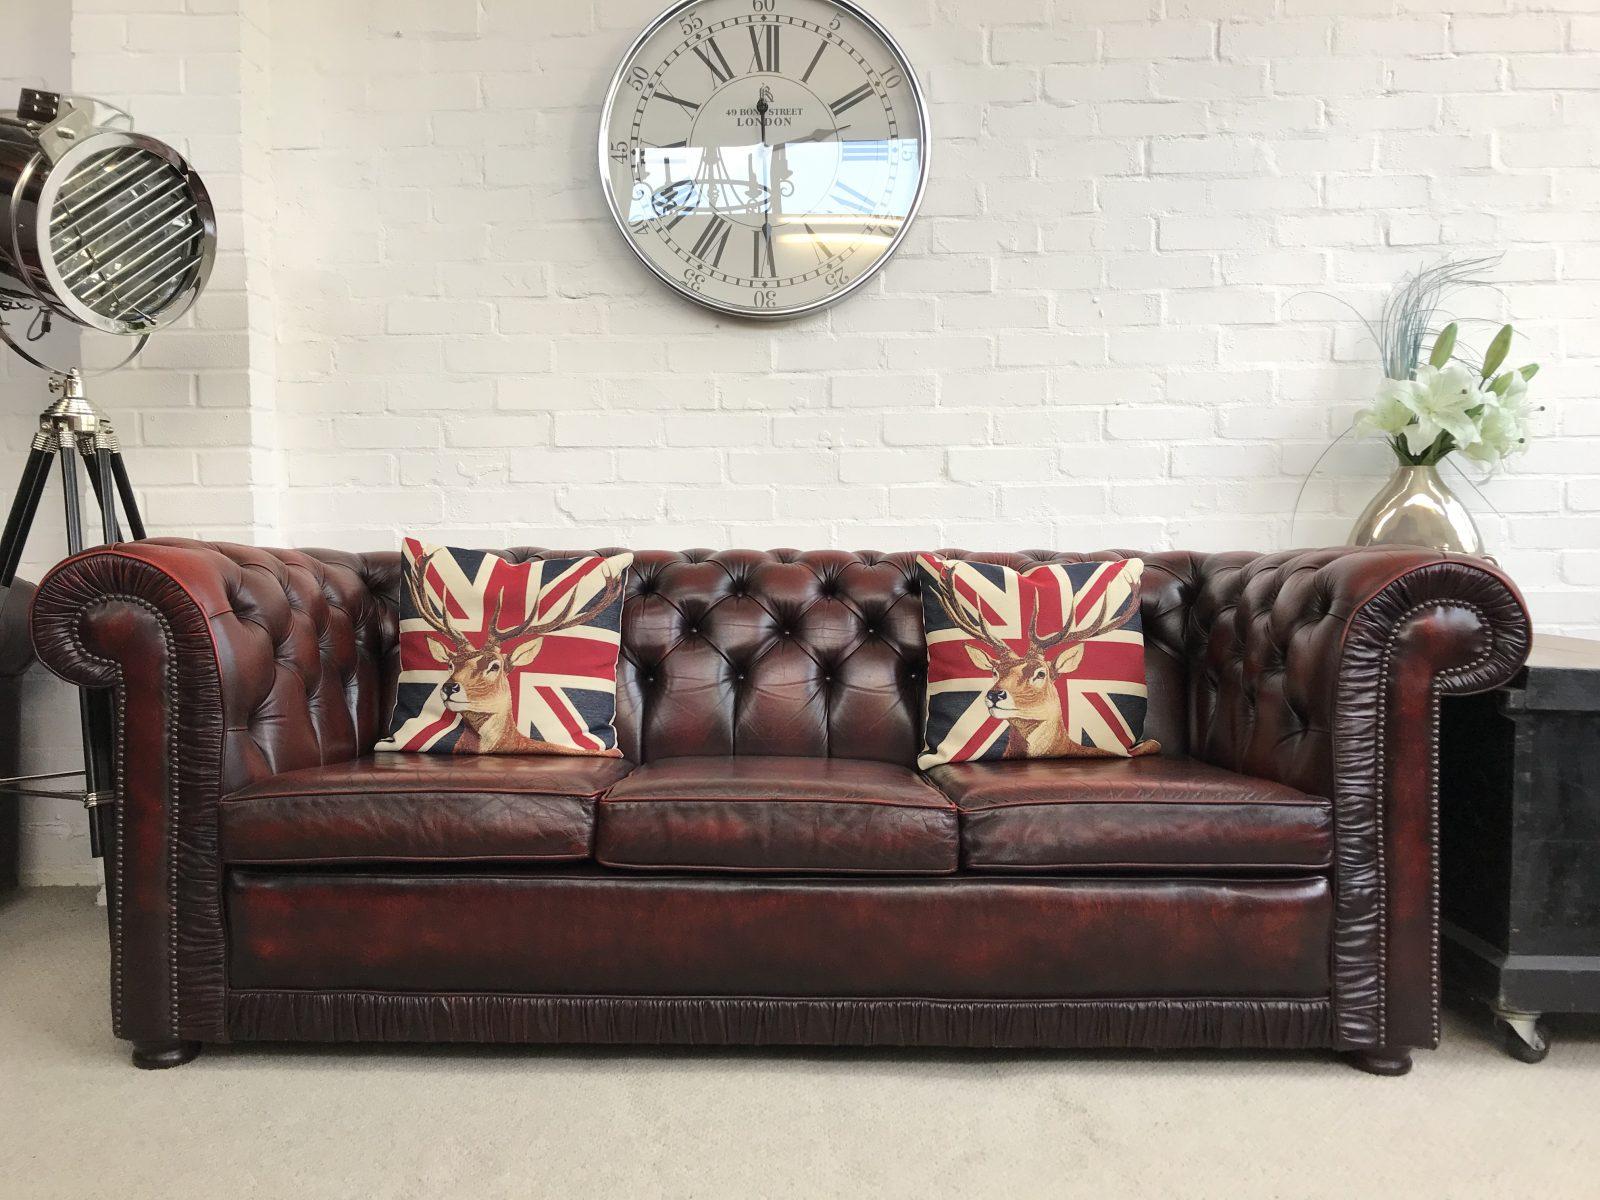 Stunning Vintage Chesterfield Sofa.